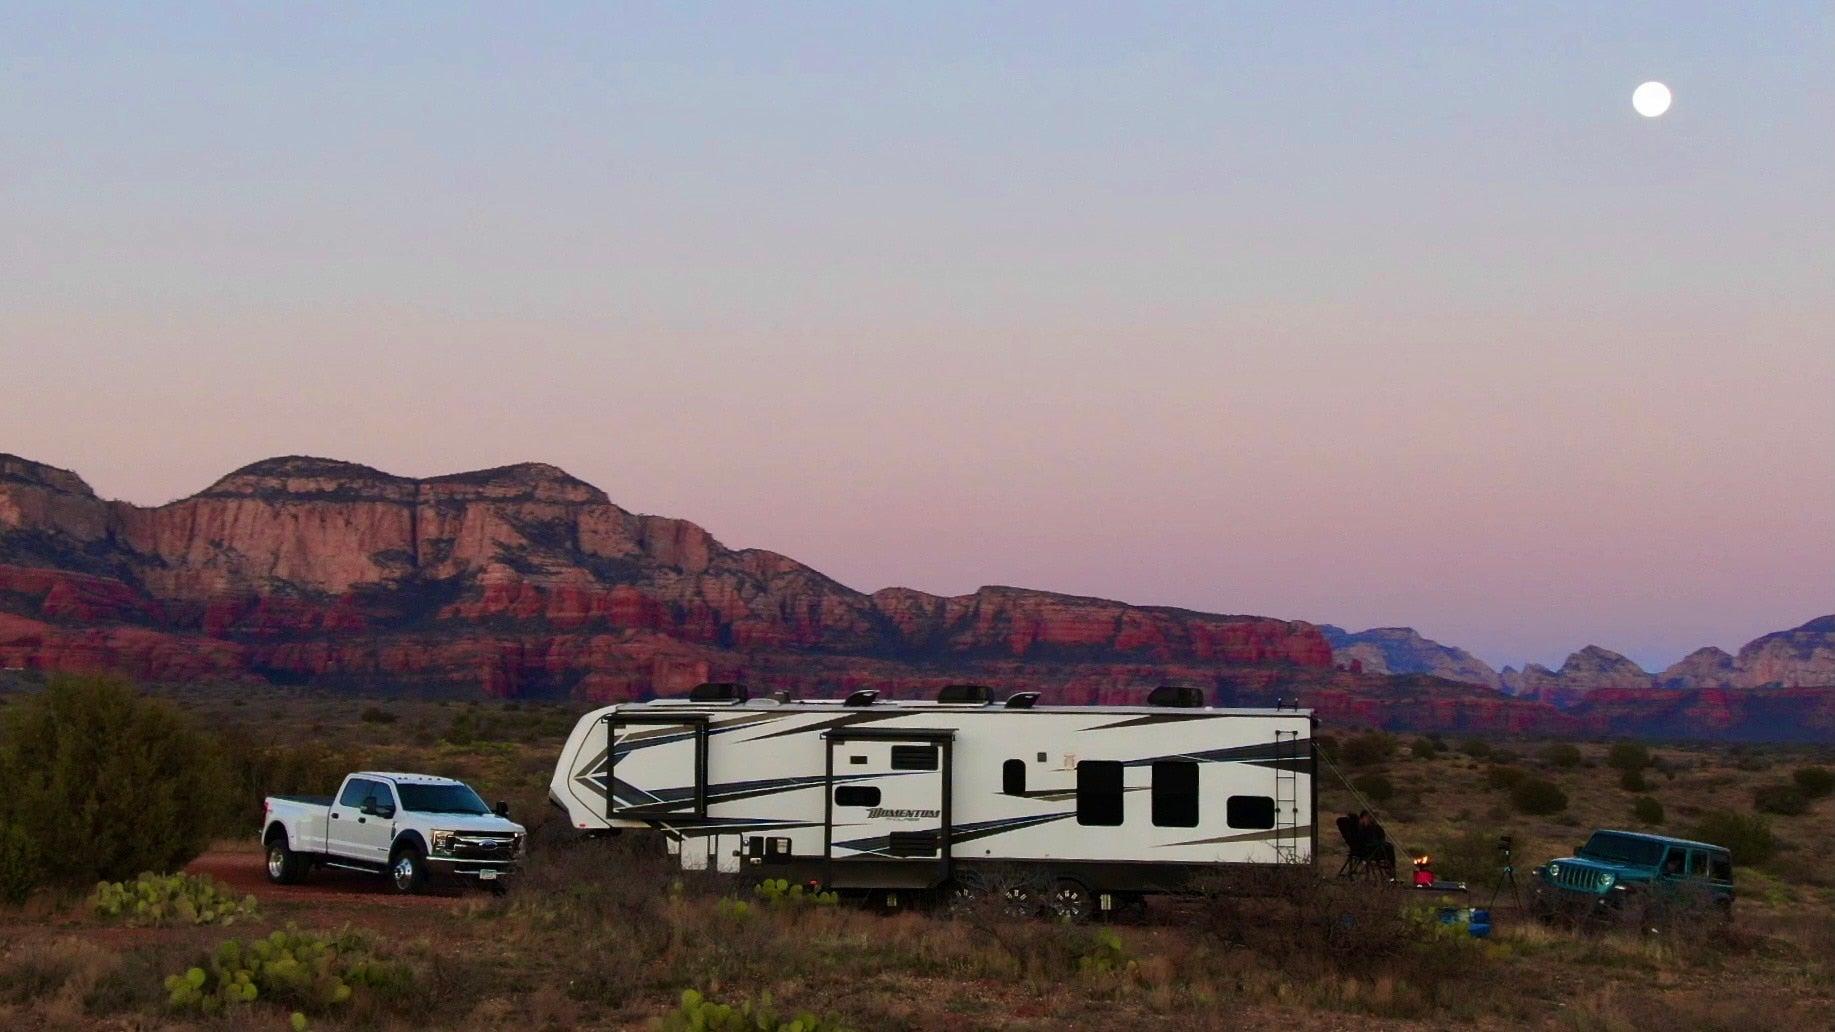 Enjoythejourney.life Tom and Cheri's RV parked boondocking in the desert.